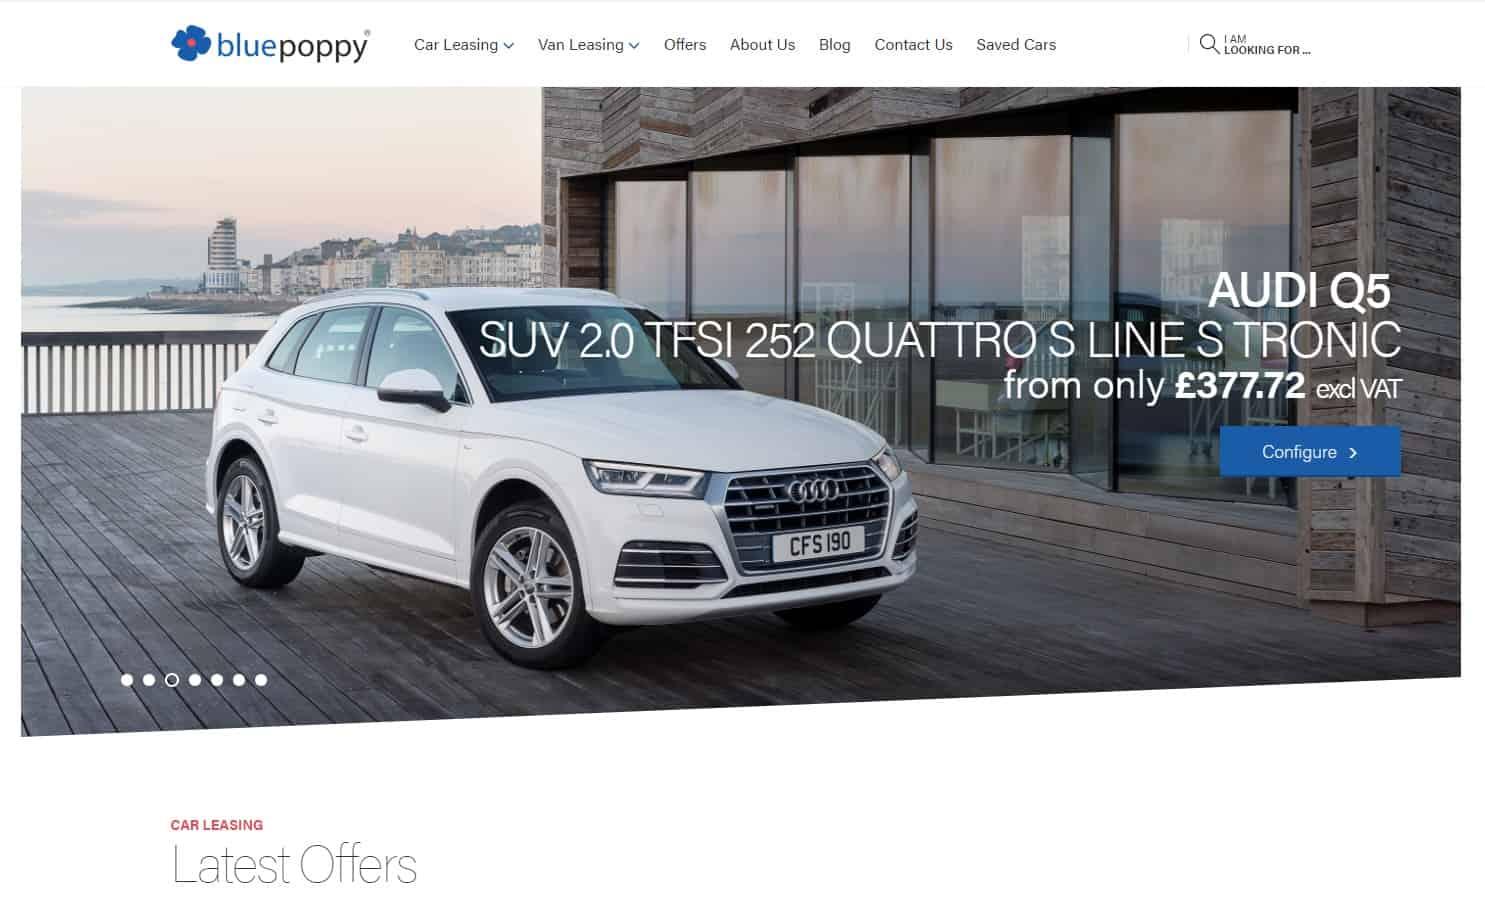 Bluepoppy website Audi Q5